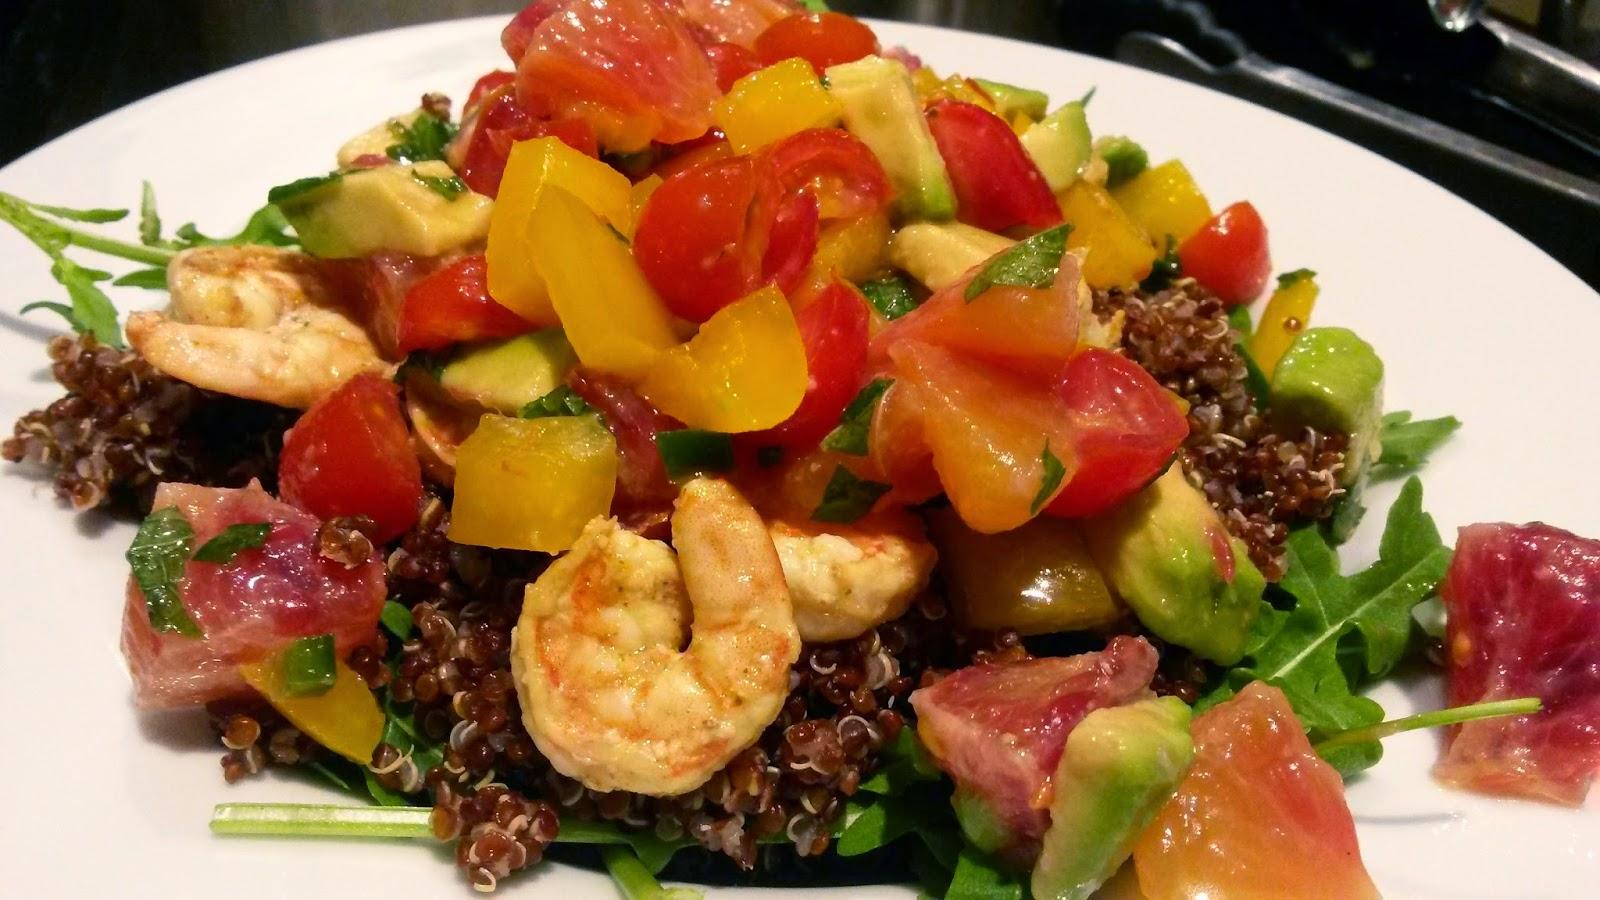 Delightful Blood Orange Avocado Pico with Chili Lime Shrimp Quinoa Salad